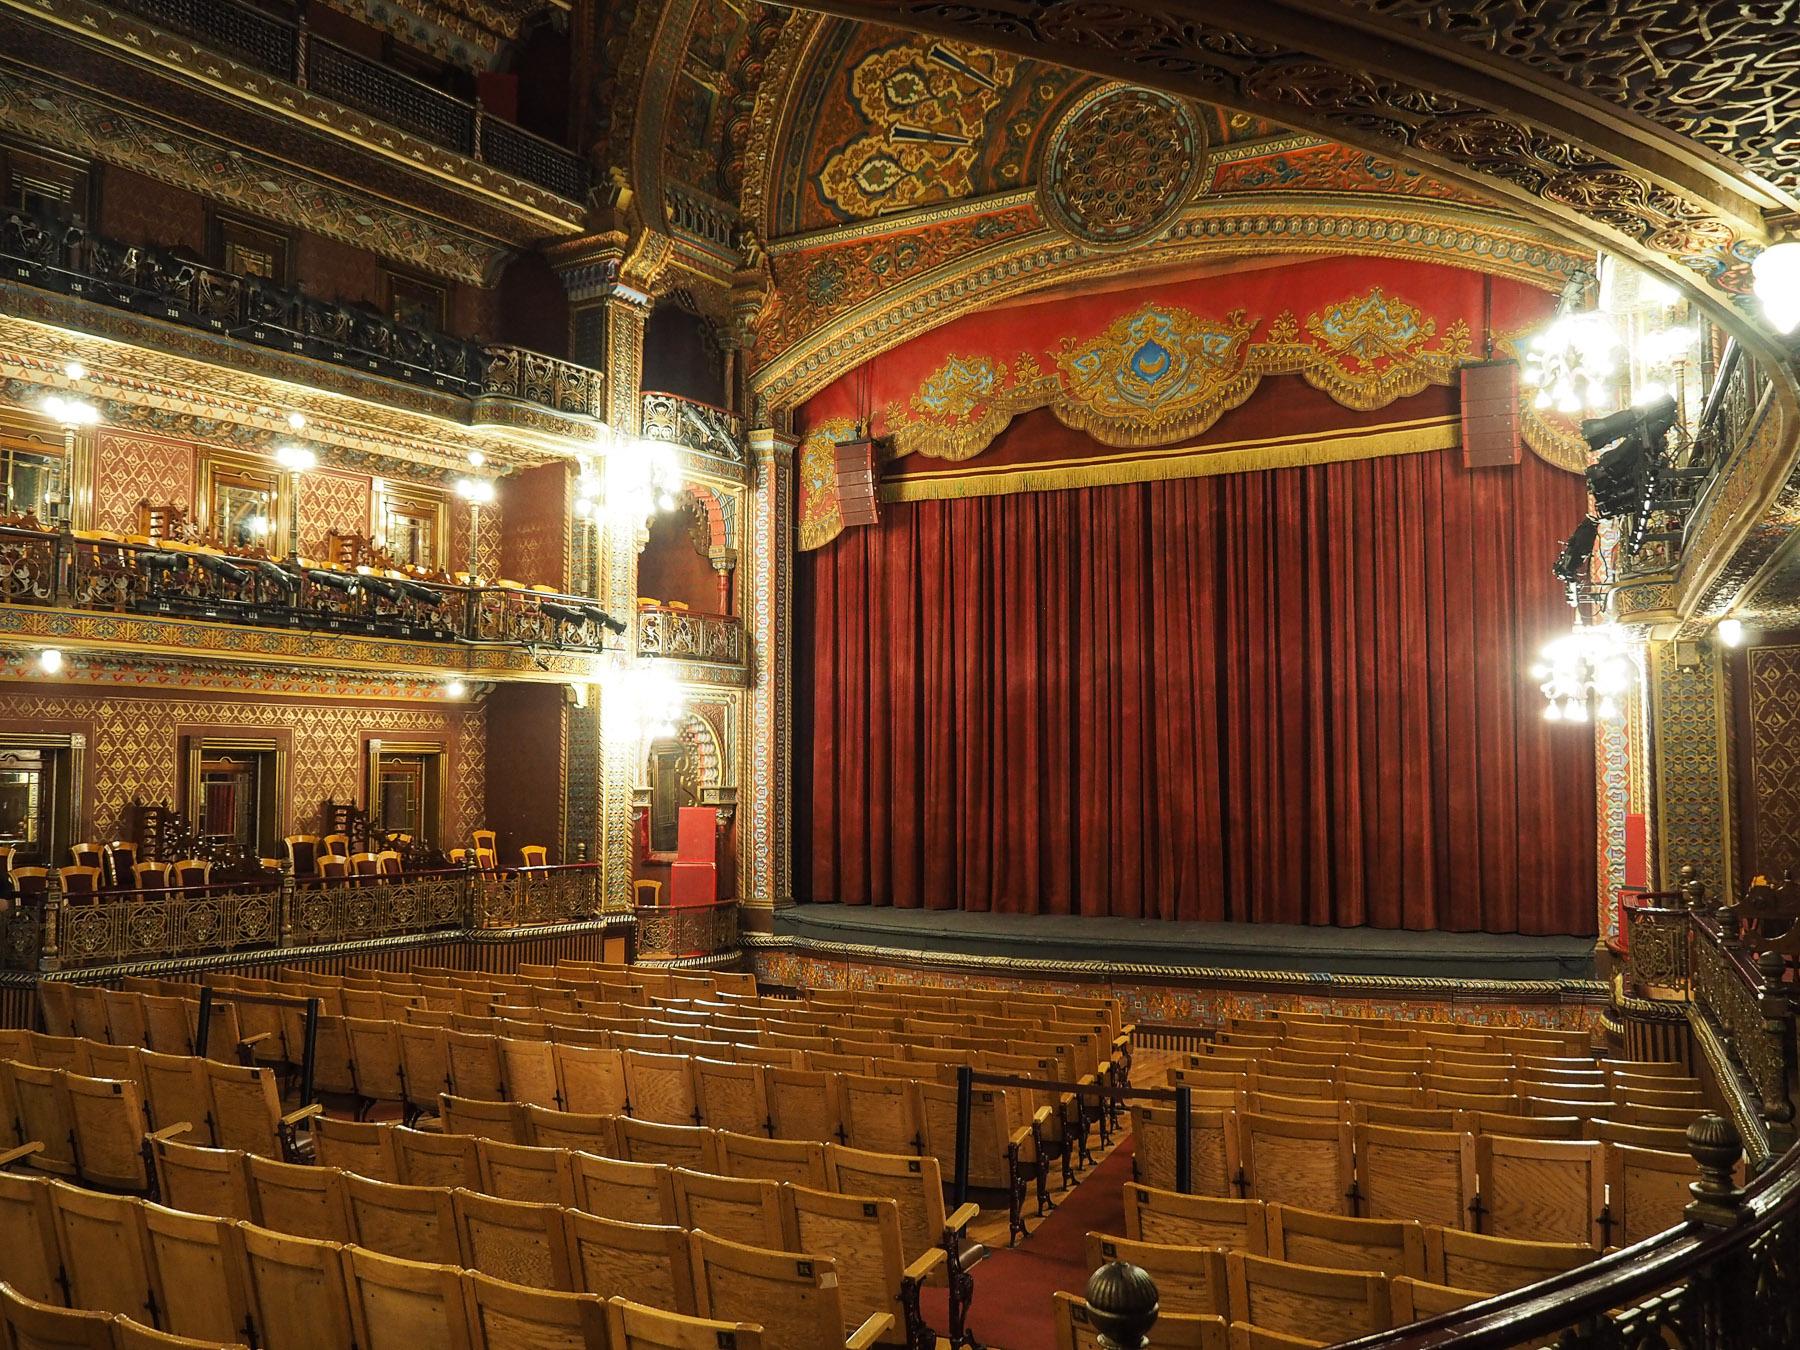 Prunkvolles kleines Teatro Juarez in Guanajuato